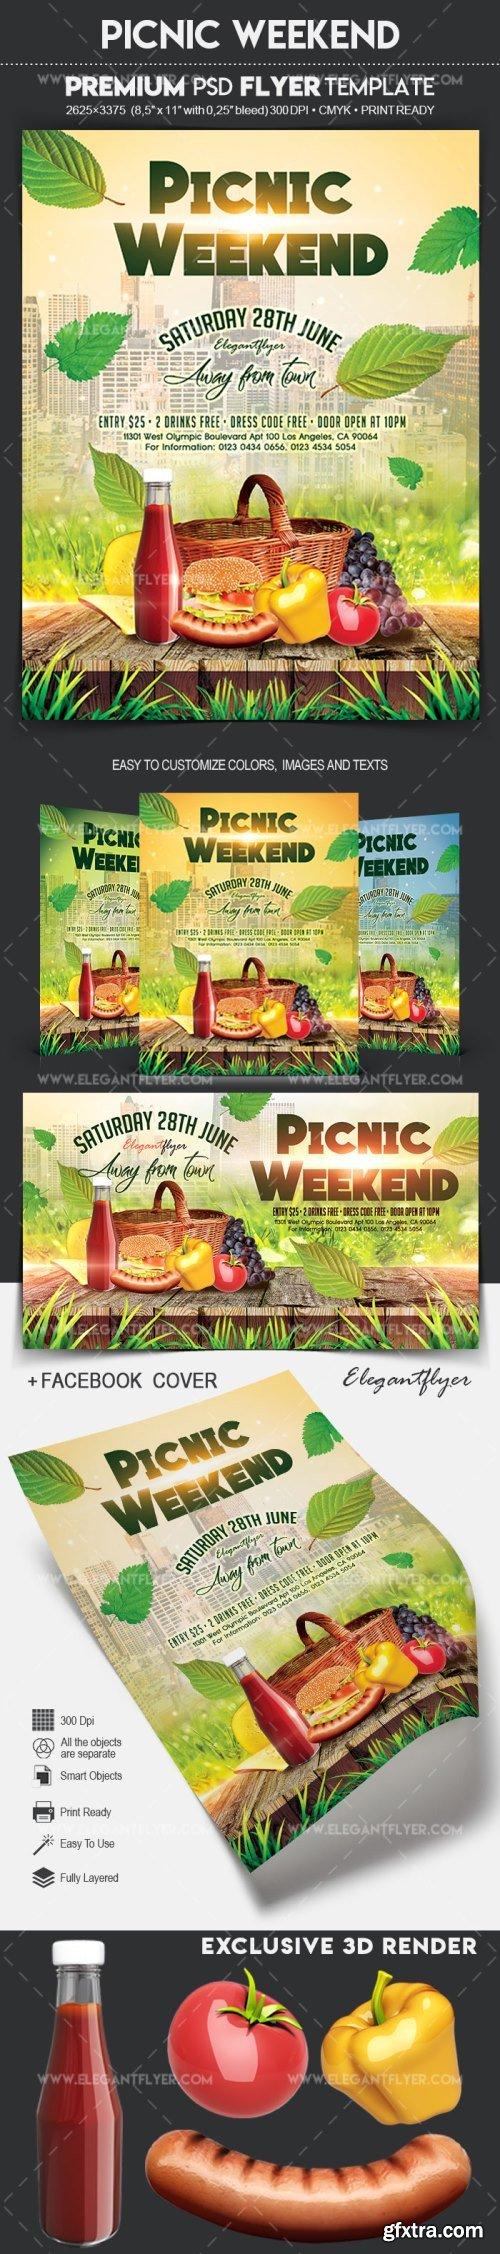 Picnic Weekend - Flyer PSD Template